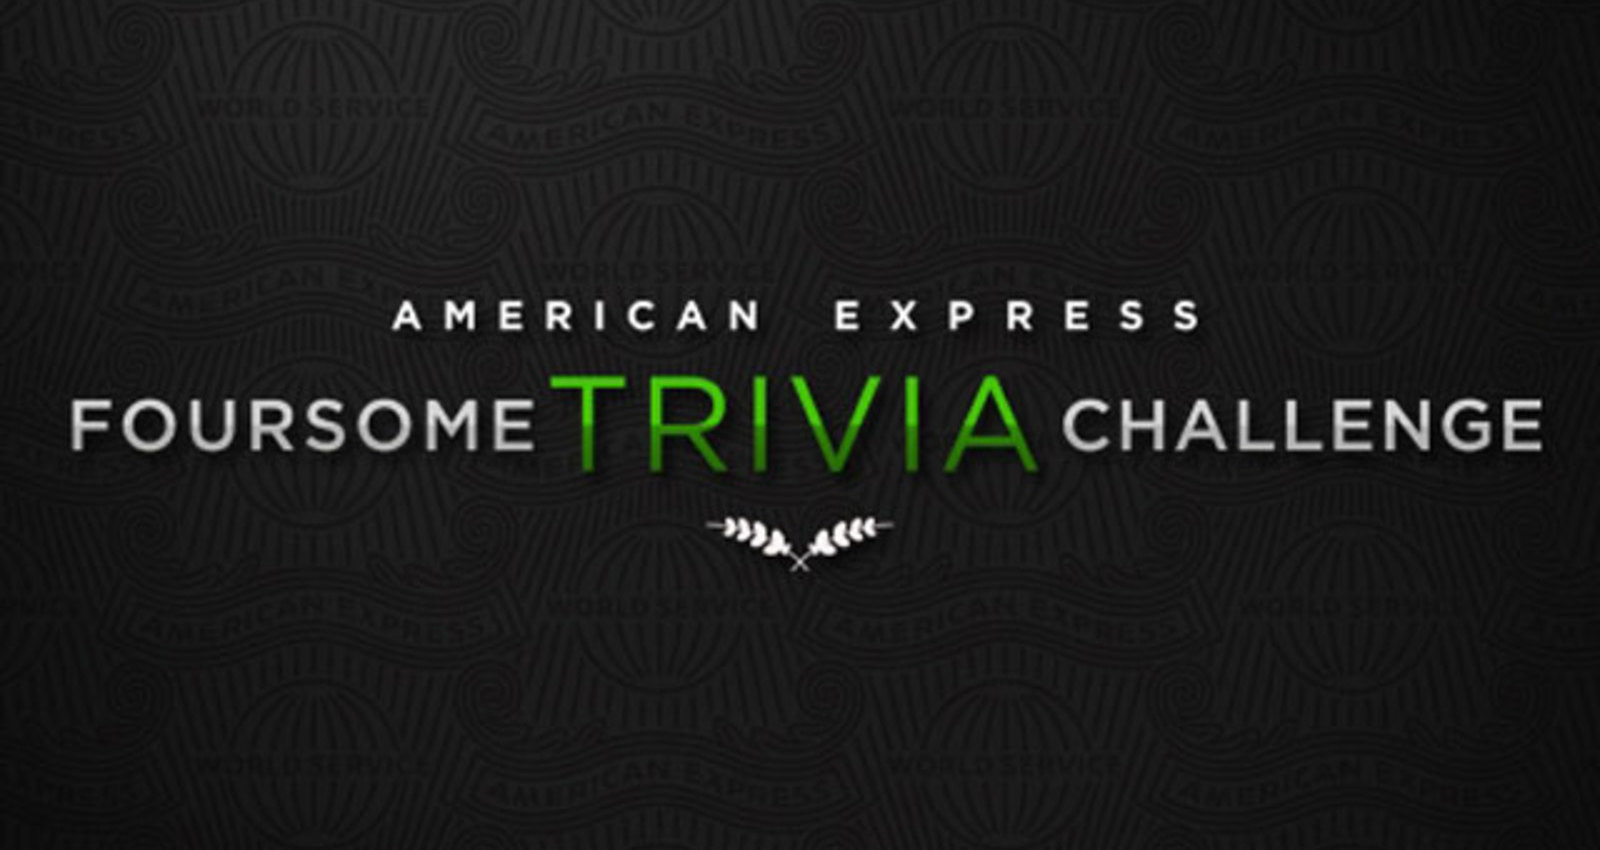 Foursome Trivia Challenge